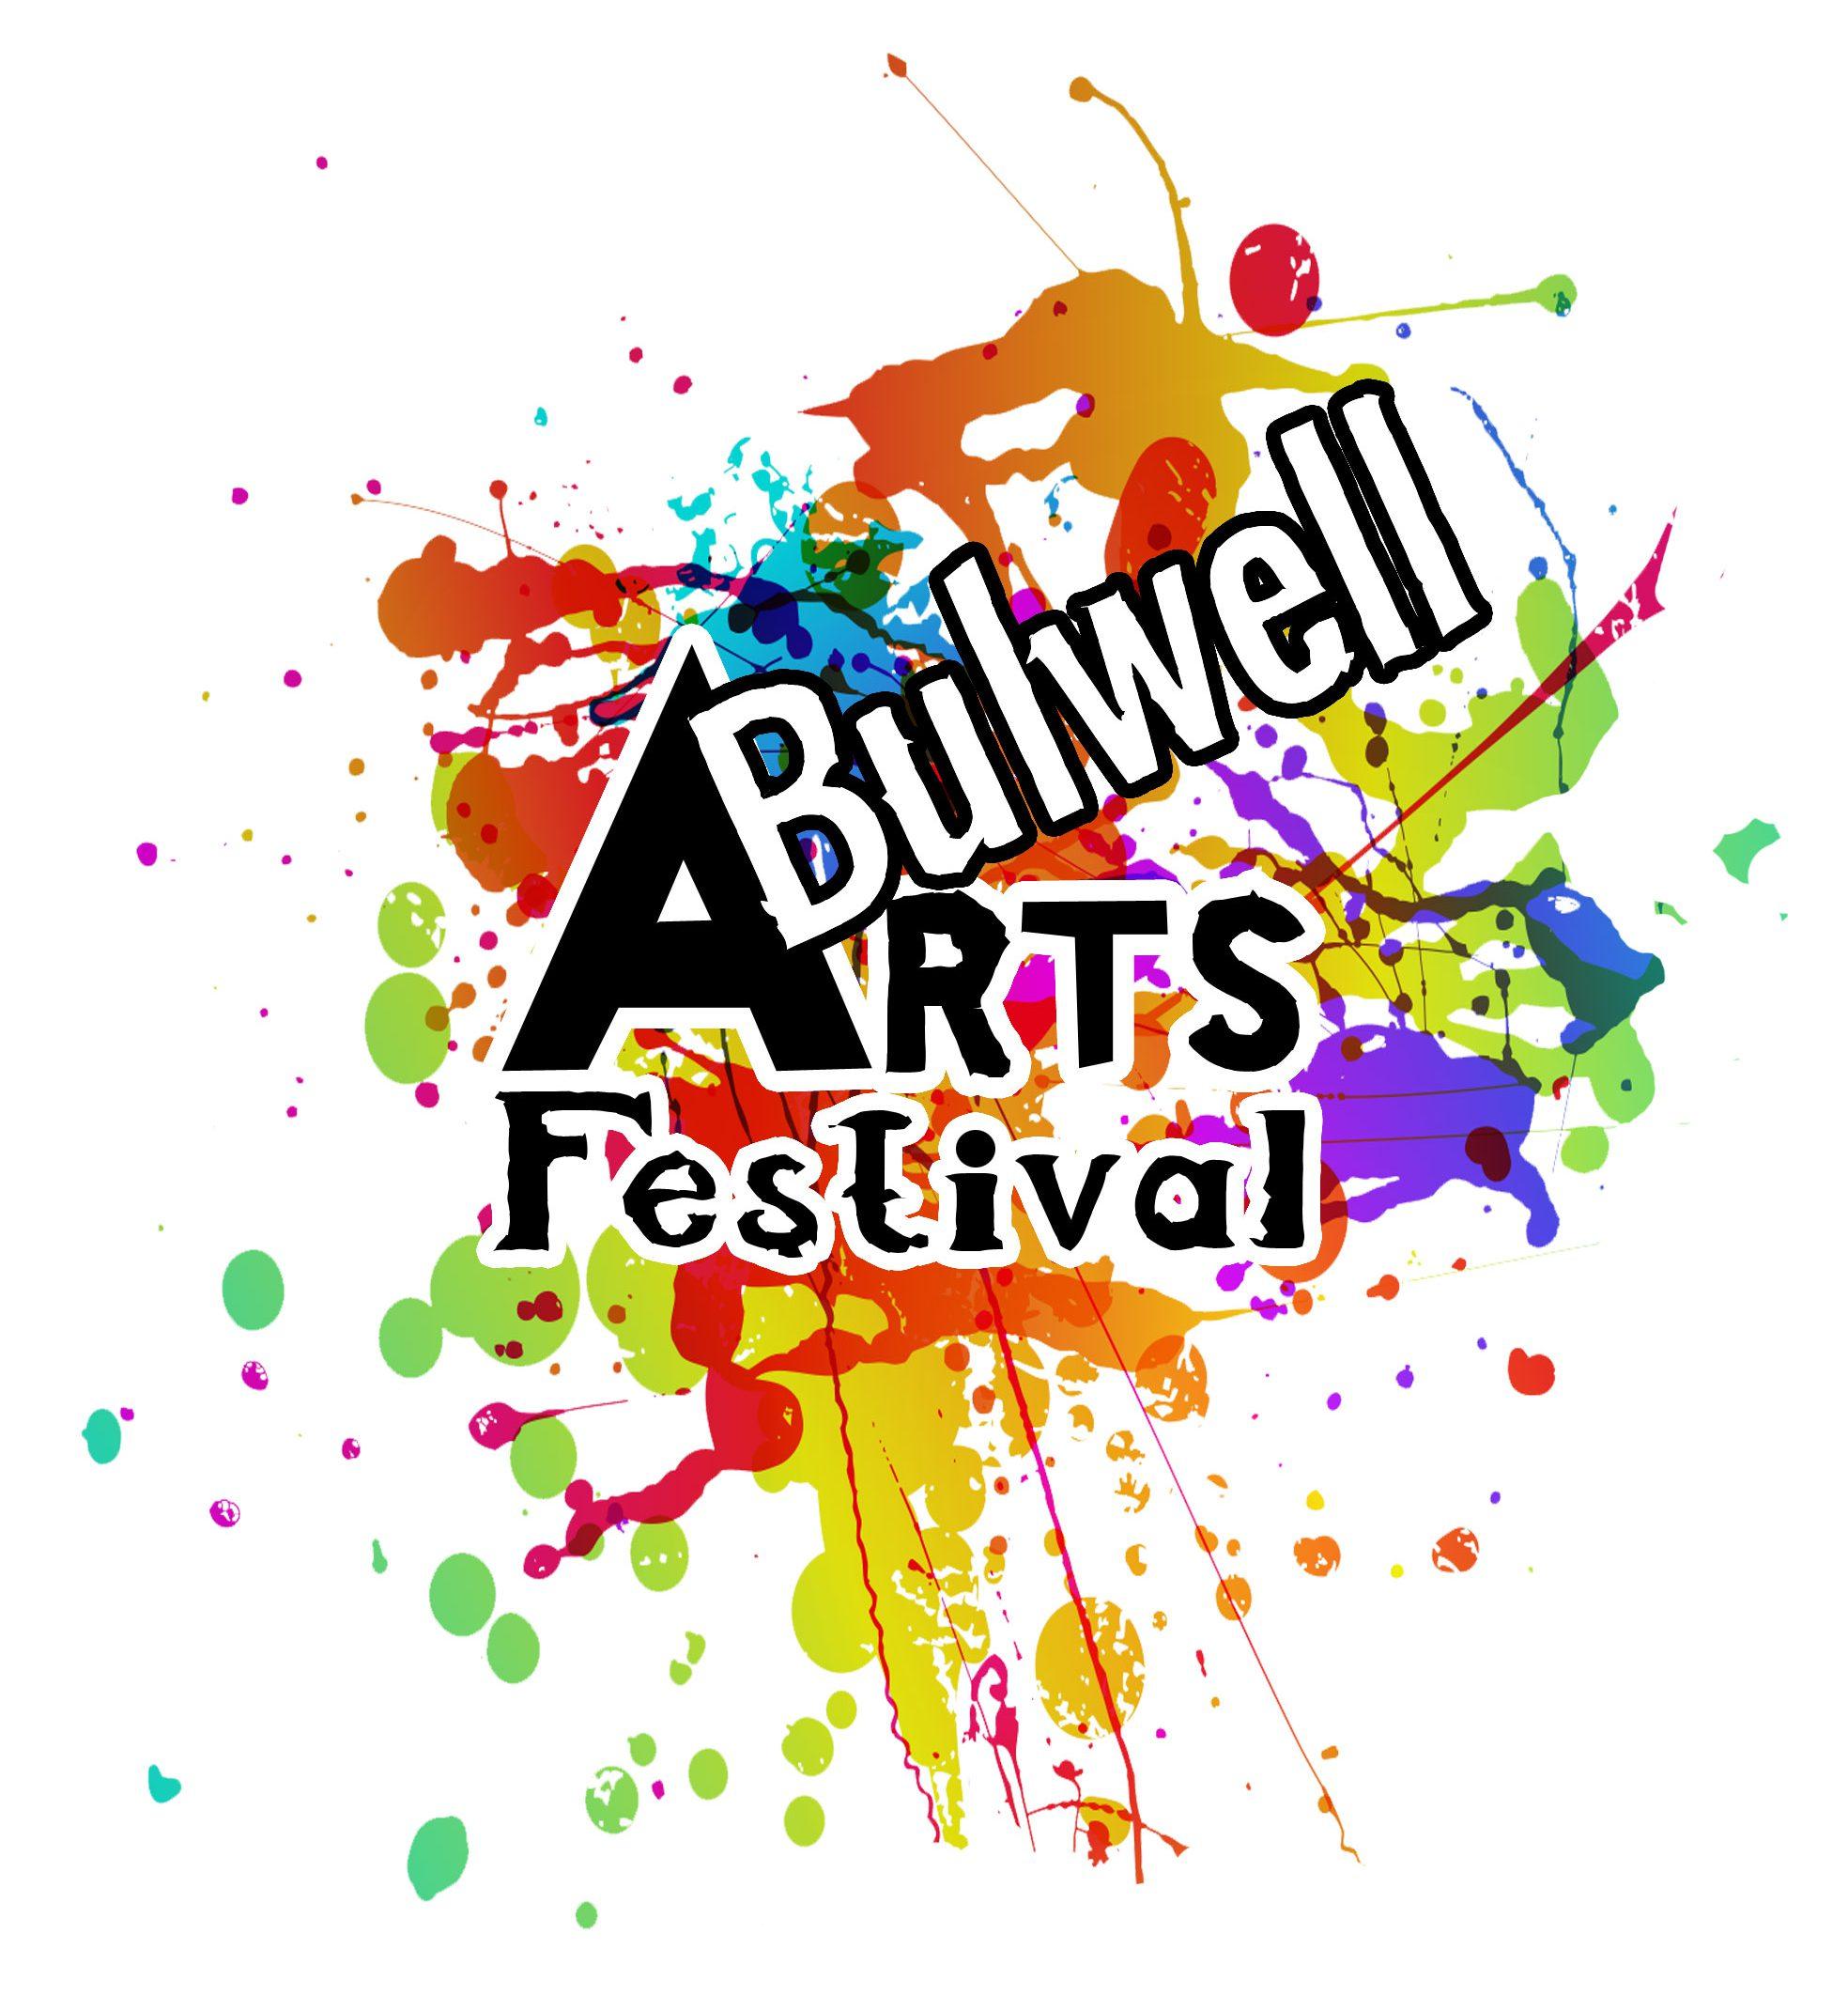 Bulwell Arts Festival 2019